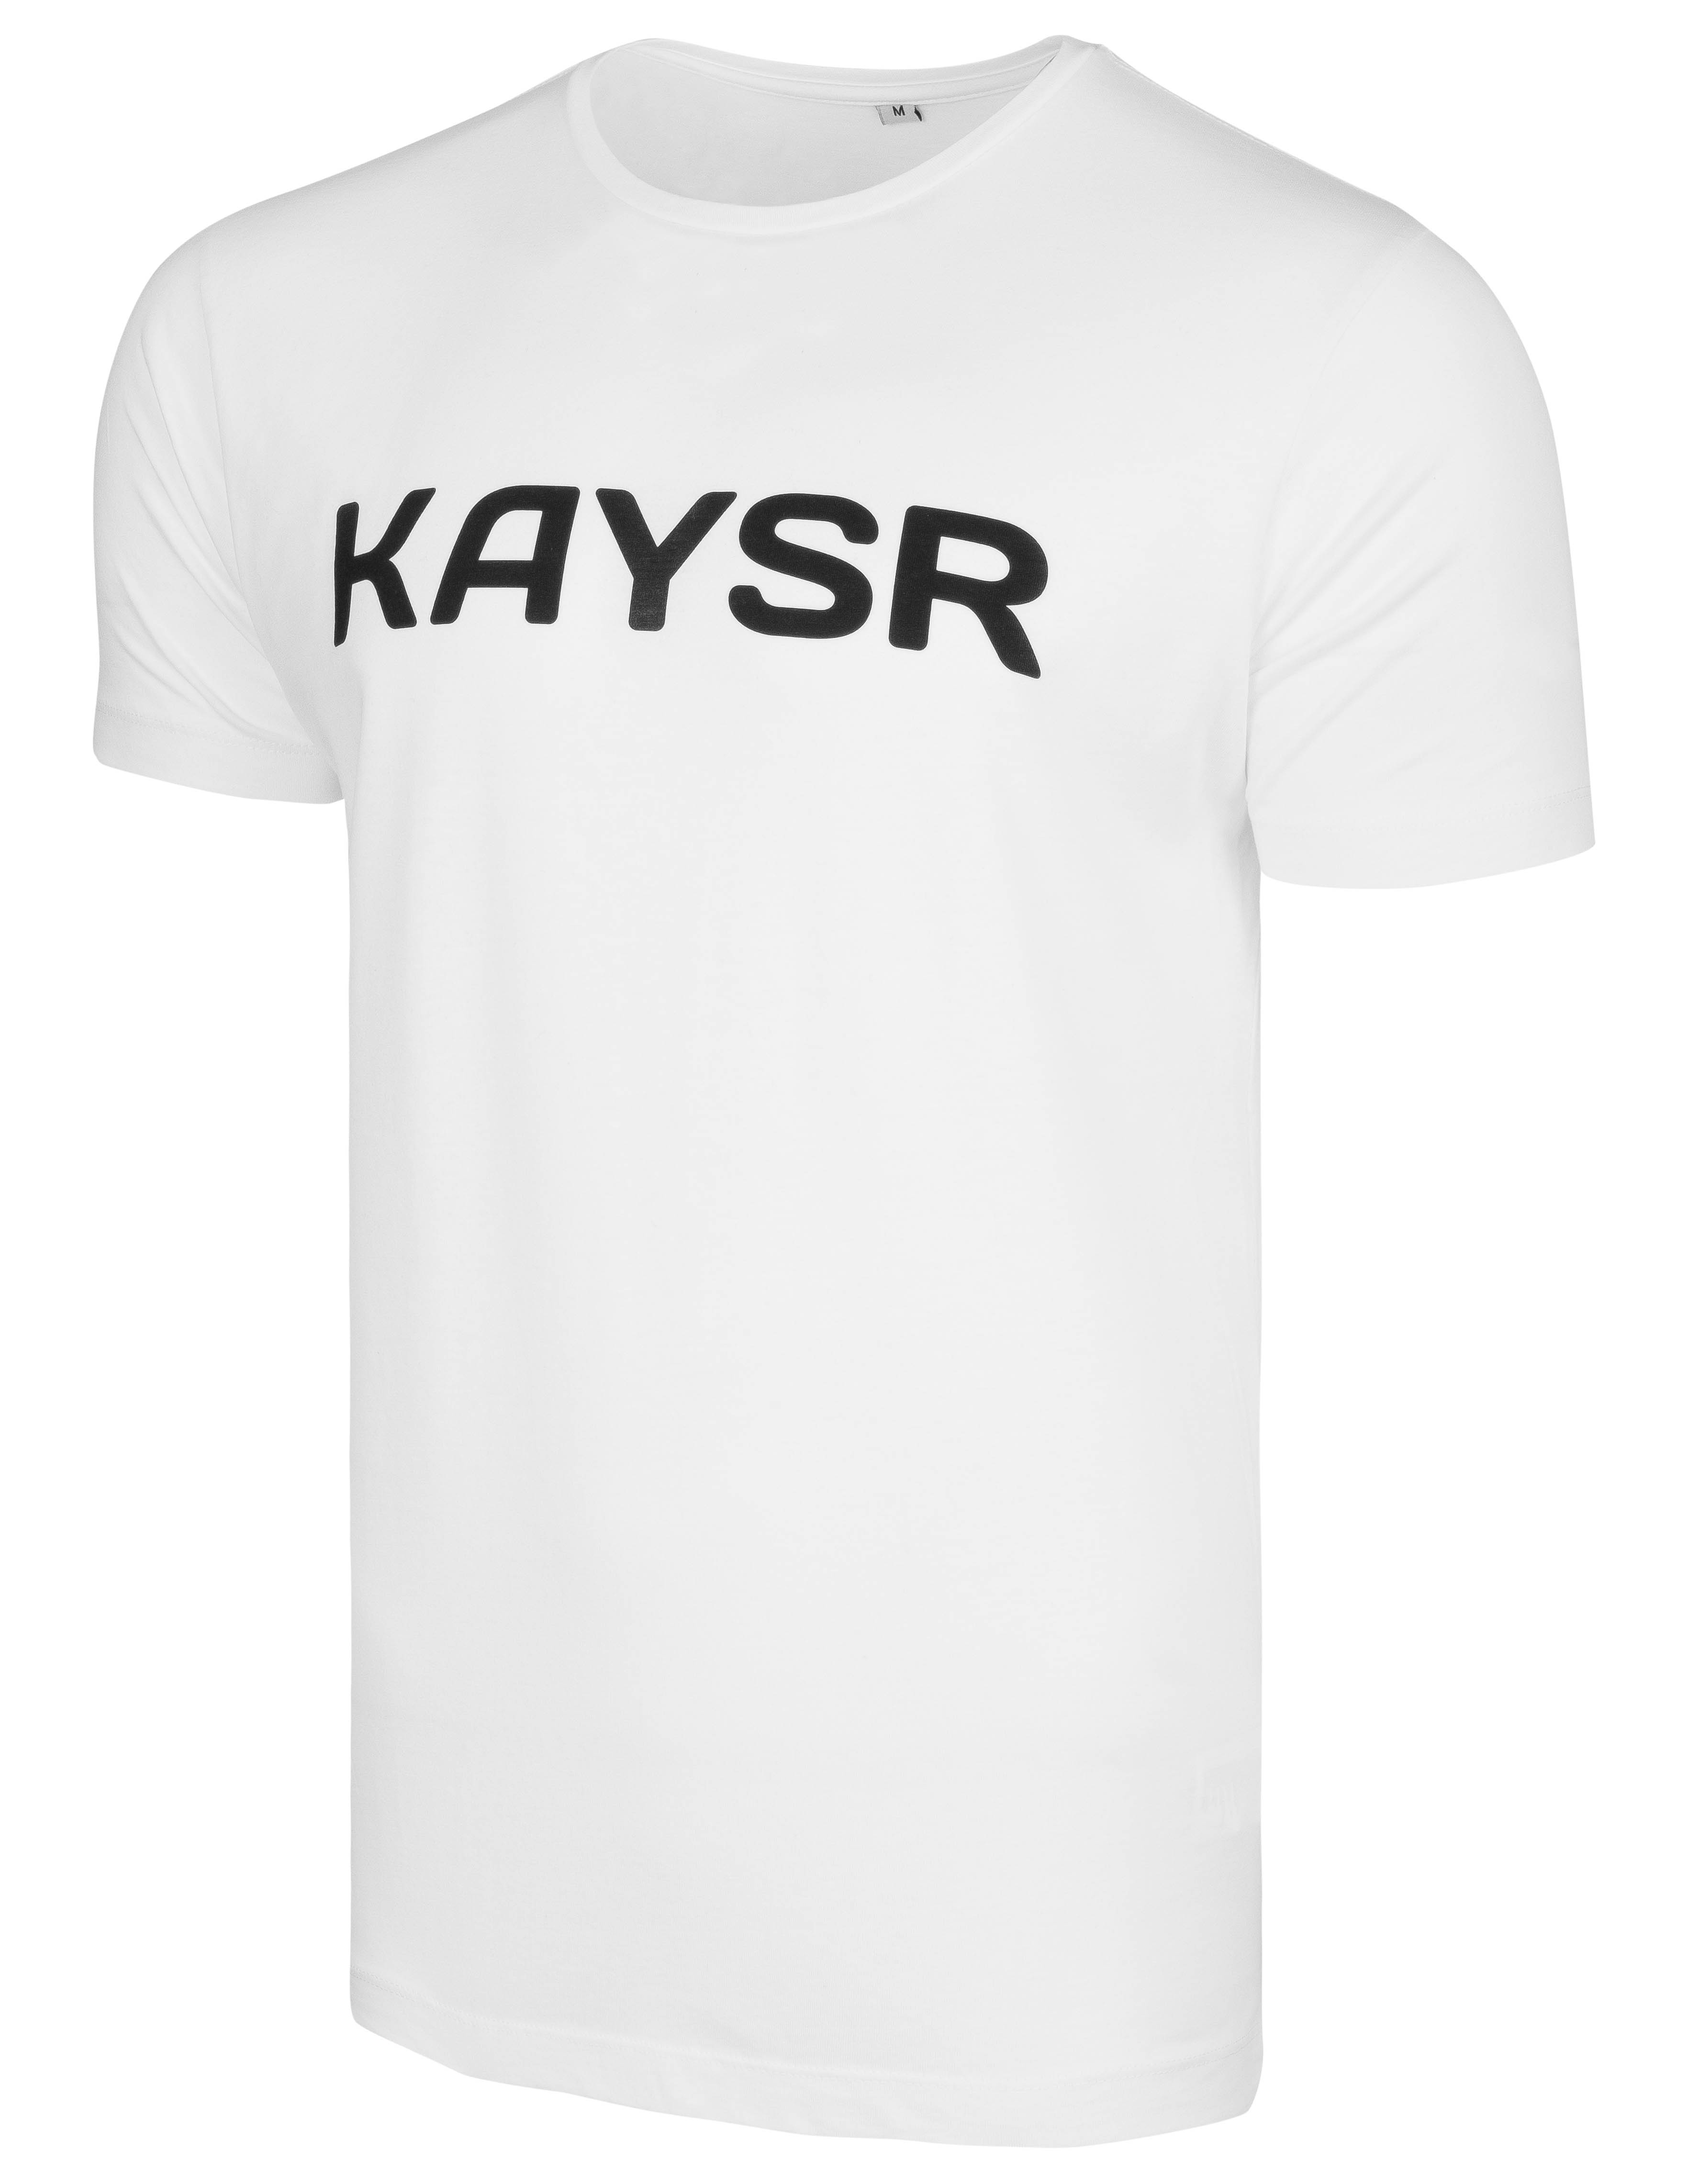 Shirt Herren Print Kurzarmshirt Casual Kurzarm Rundhals Logo Aufdruck Übergöße